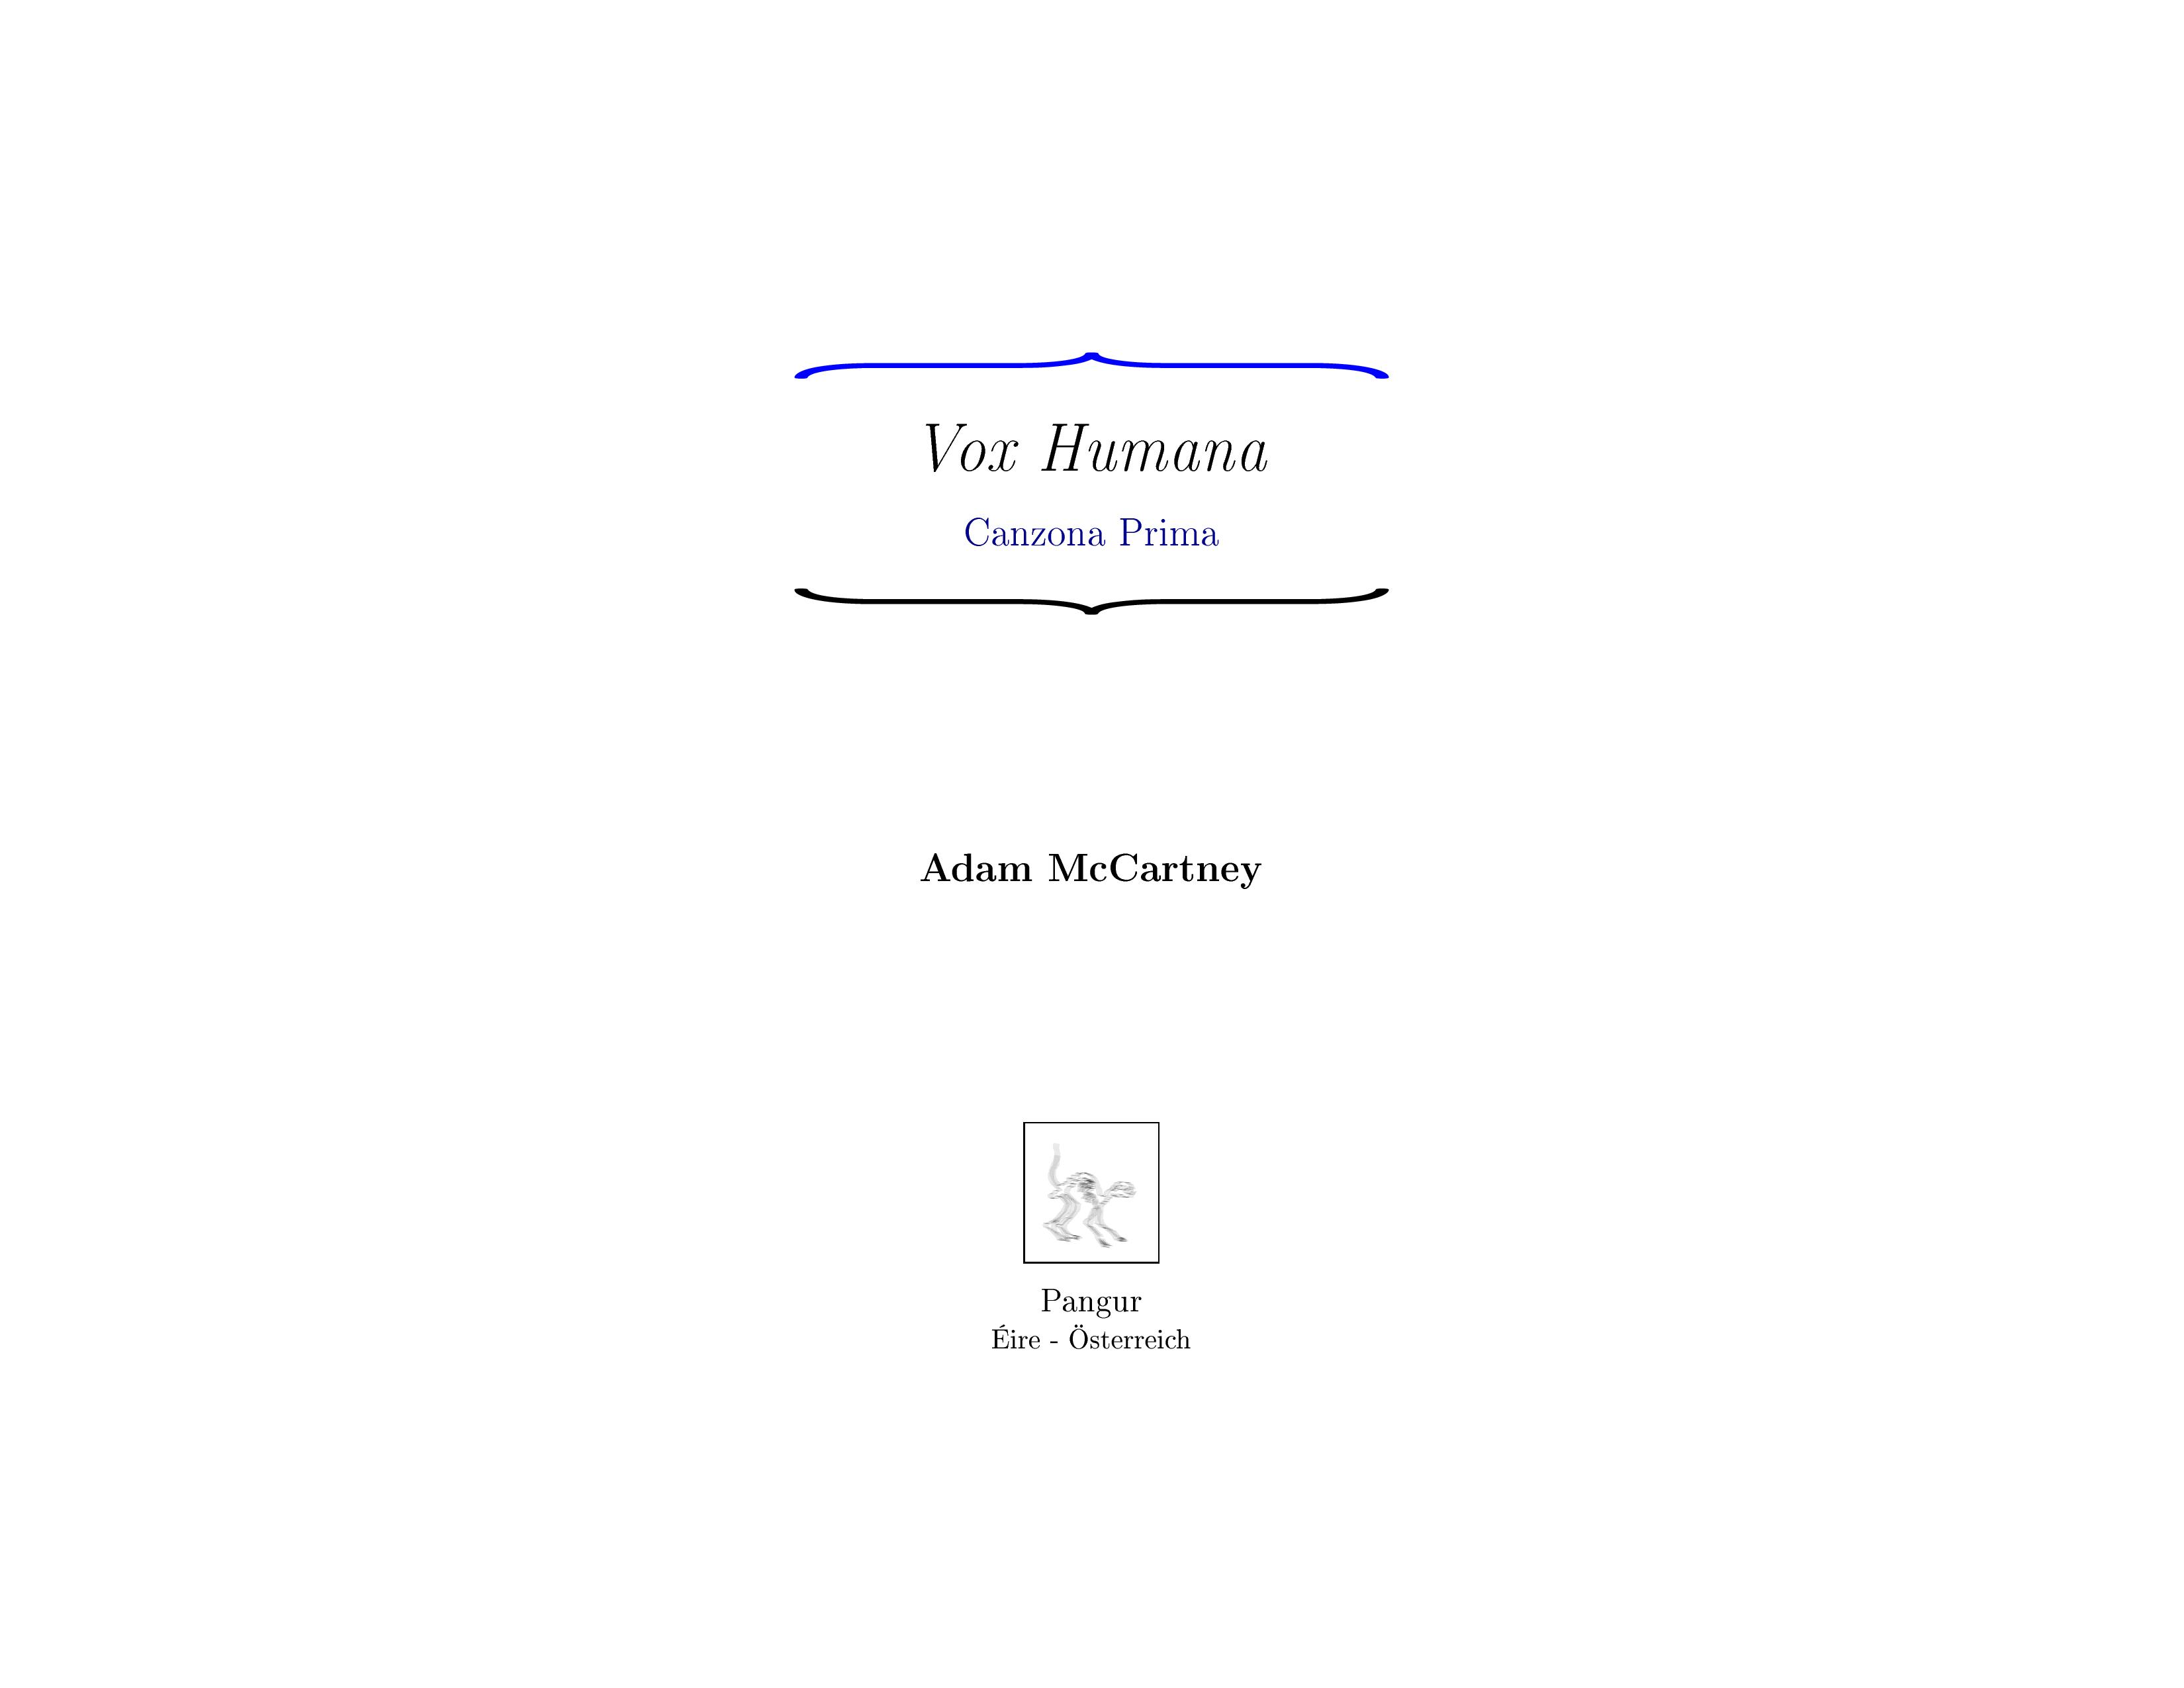 Mccartney vox humana page 001